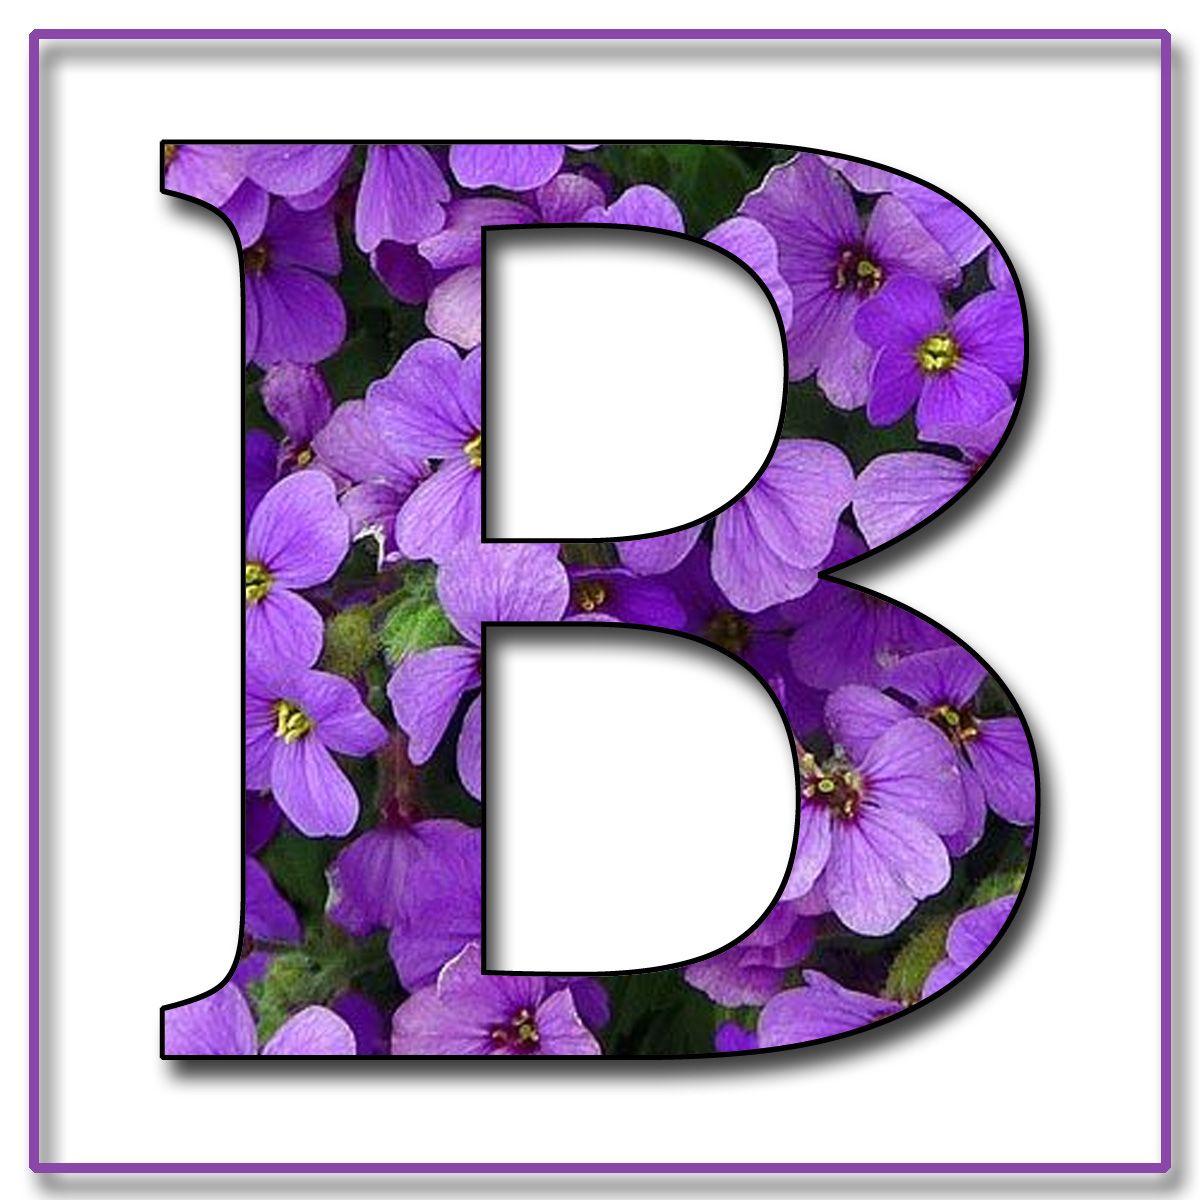 How to scrapbook letters - Granny Enchanted S Blog Purple Flowers Free Scrapbook Alphabet Letters